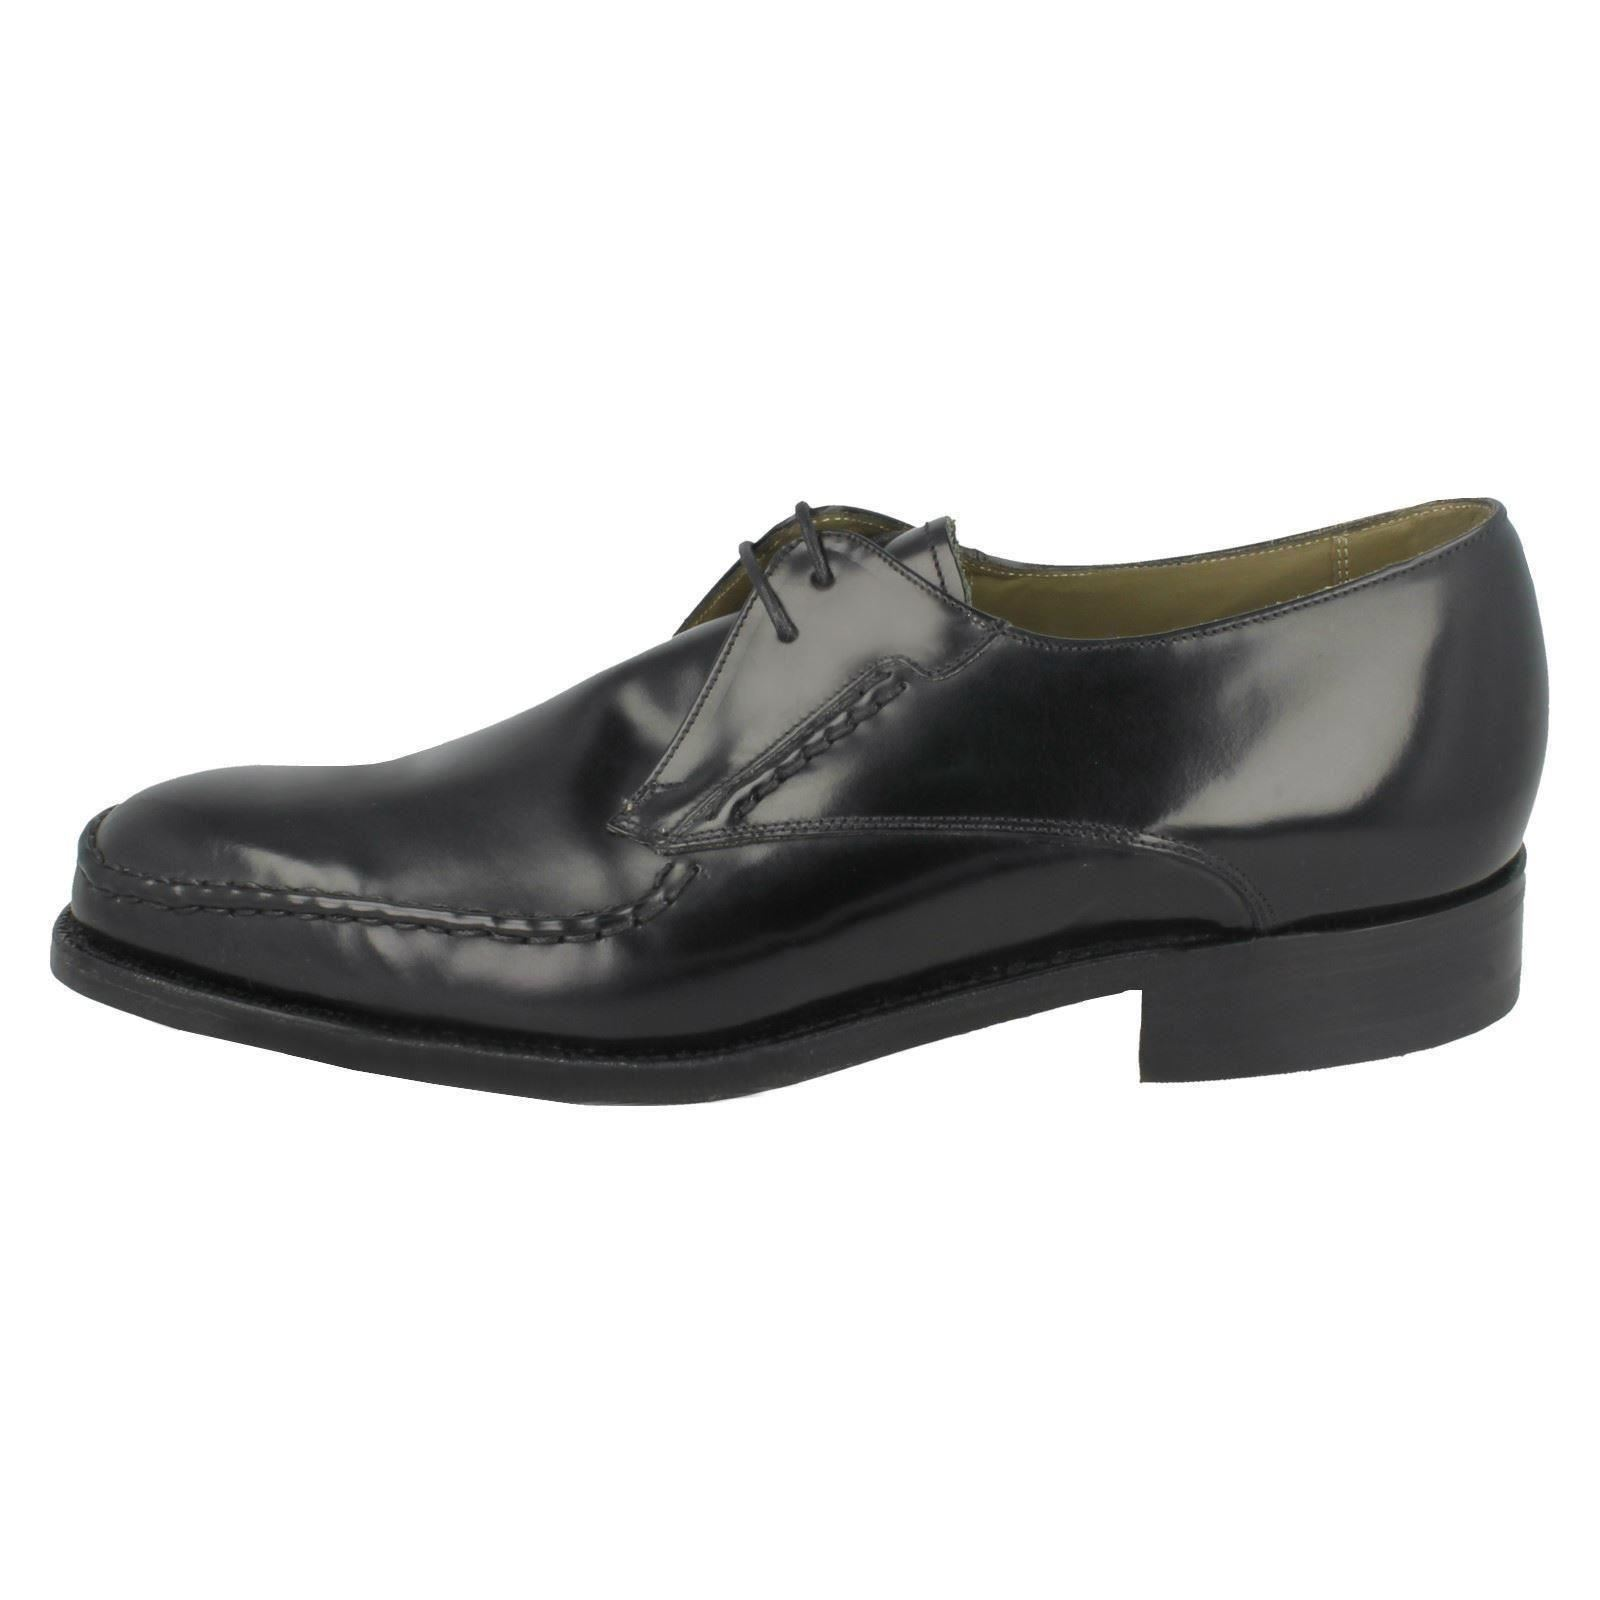 52c27ea2 Barker-Mens-Formal-Shoes-Pitney thumbnail 3